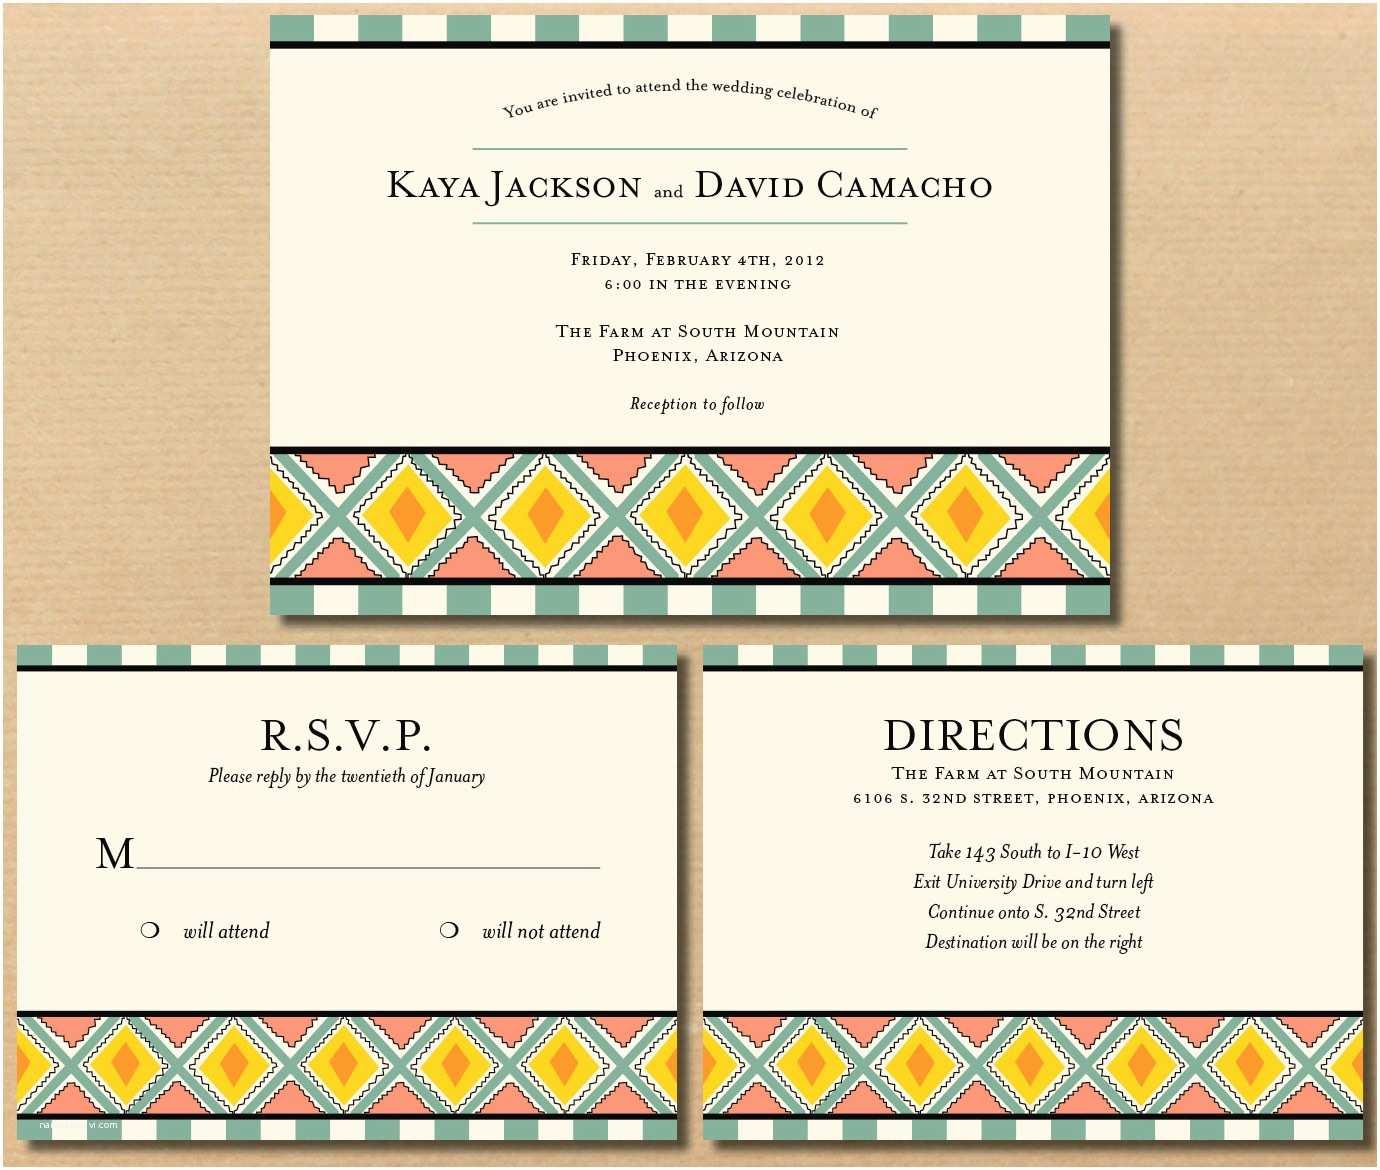 Native Wedding Invitations River & Bridge Native American Influenced Wedding Invitations